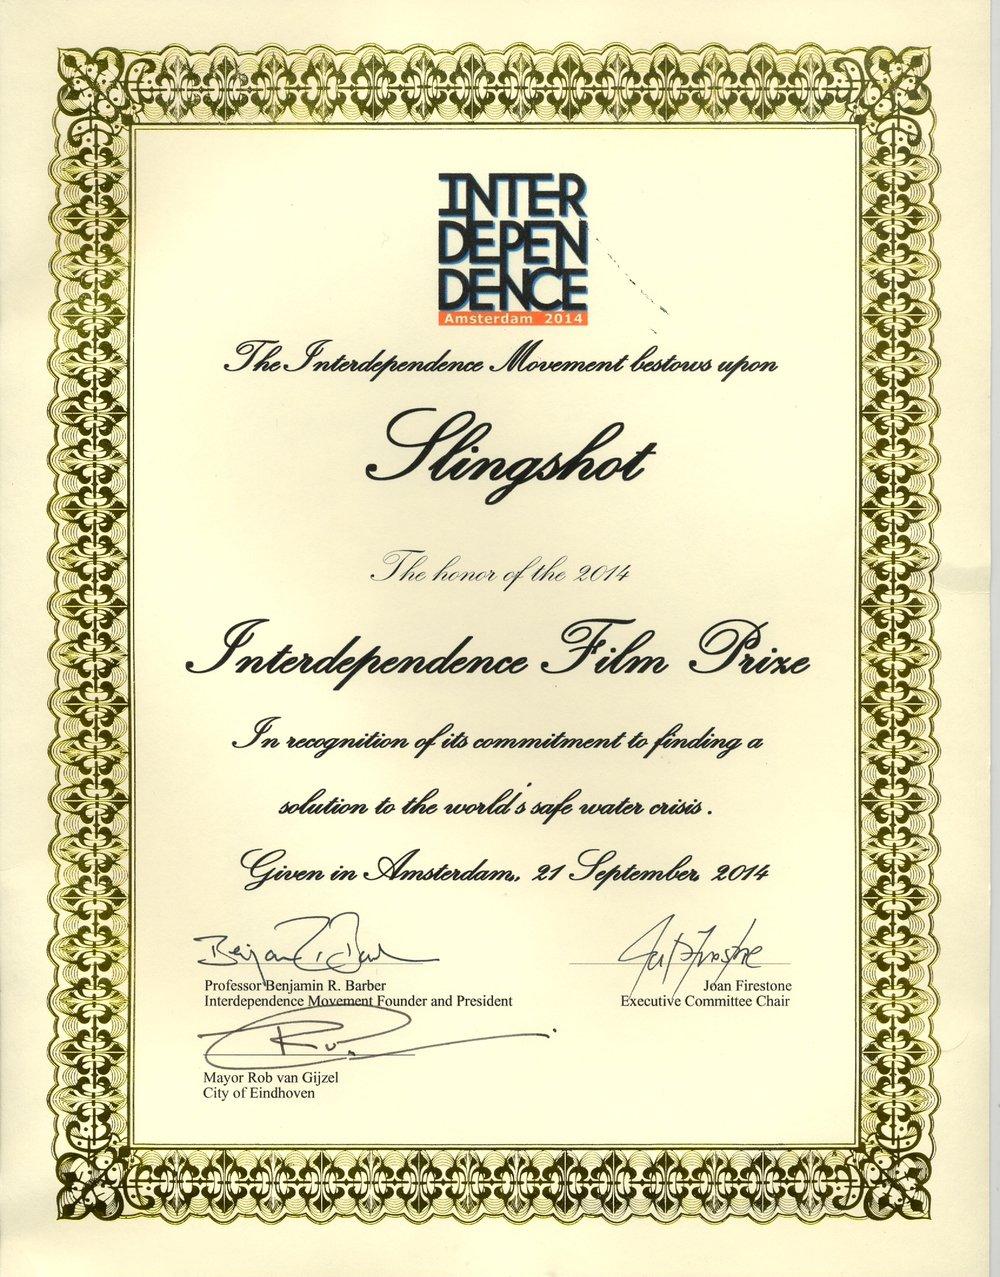 SS-Interdependence-Award-10-29-14.jpg